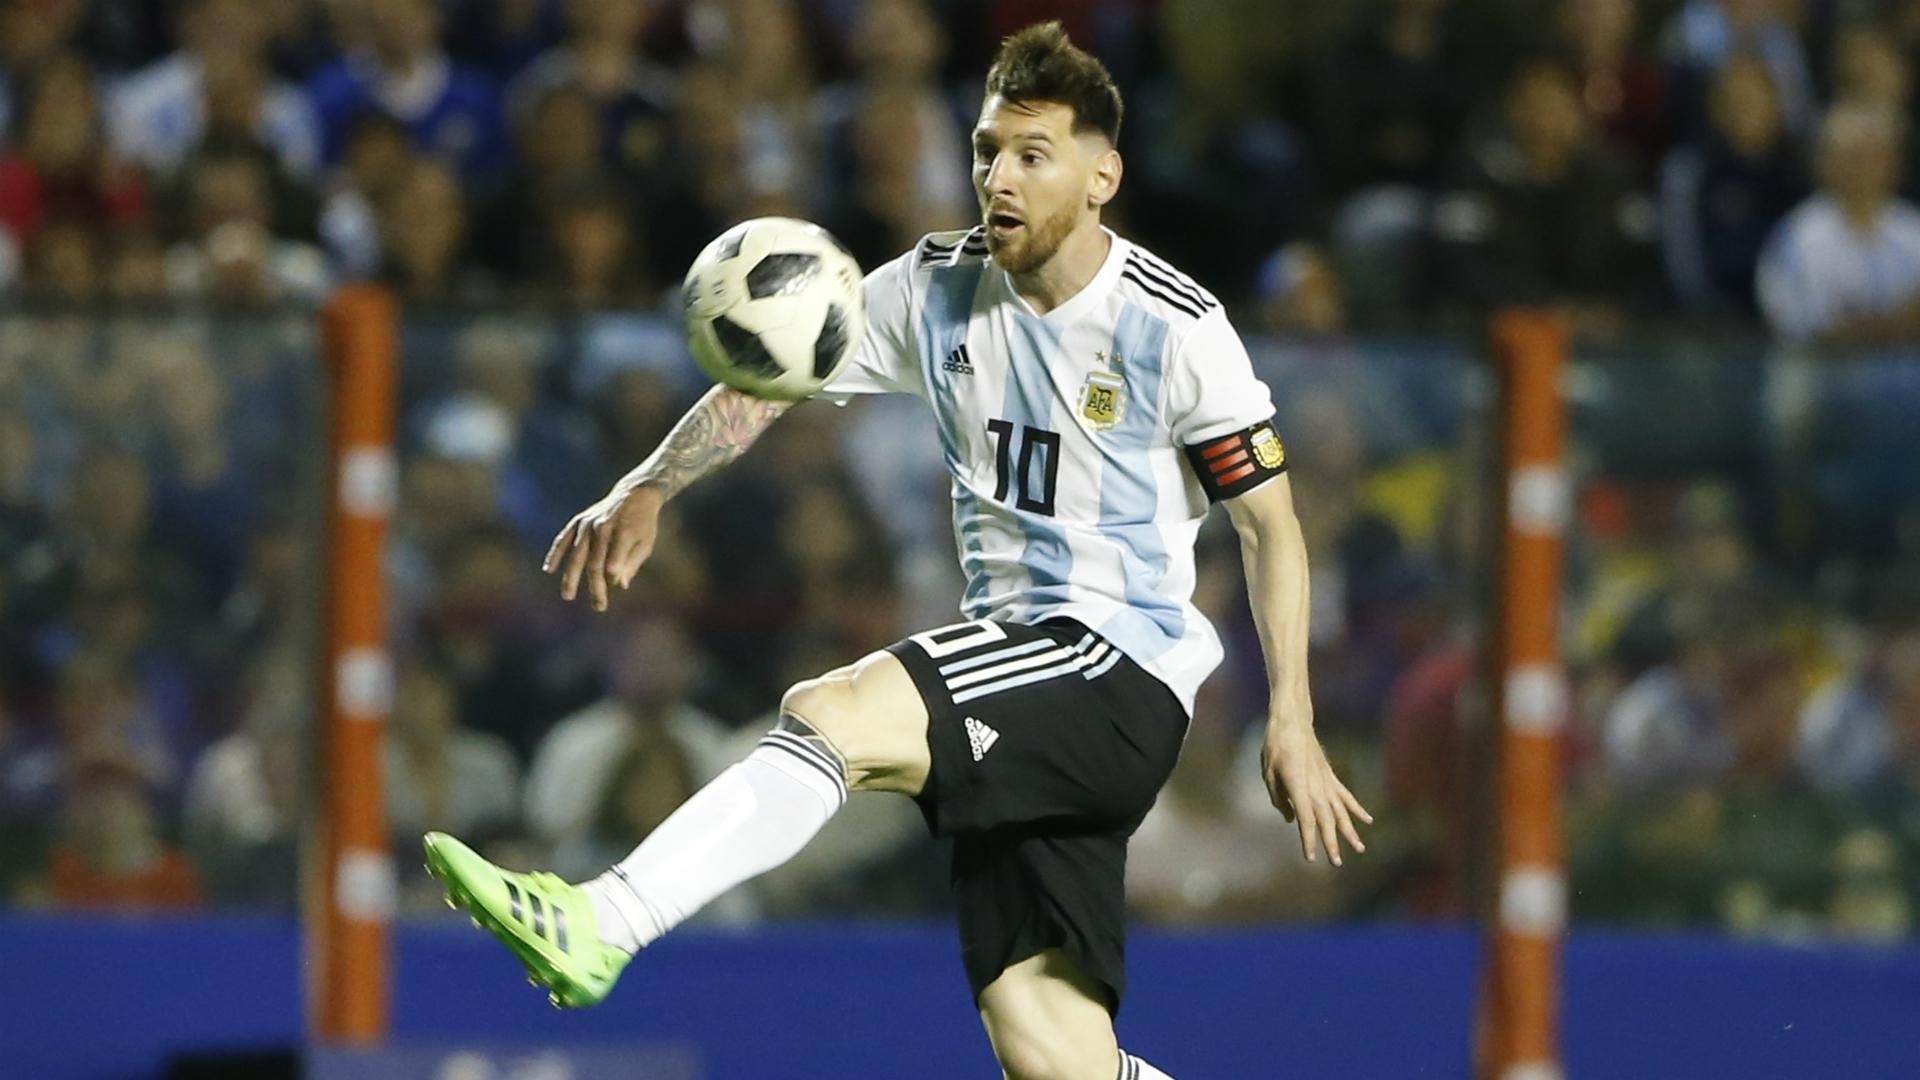 Lionel Messi - Argentina skipper